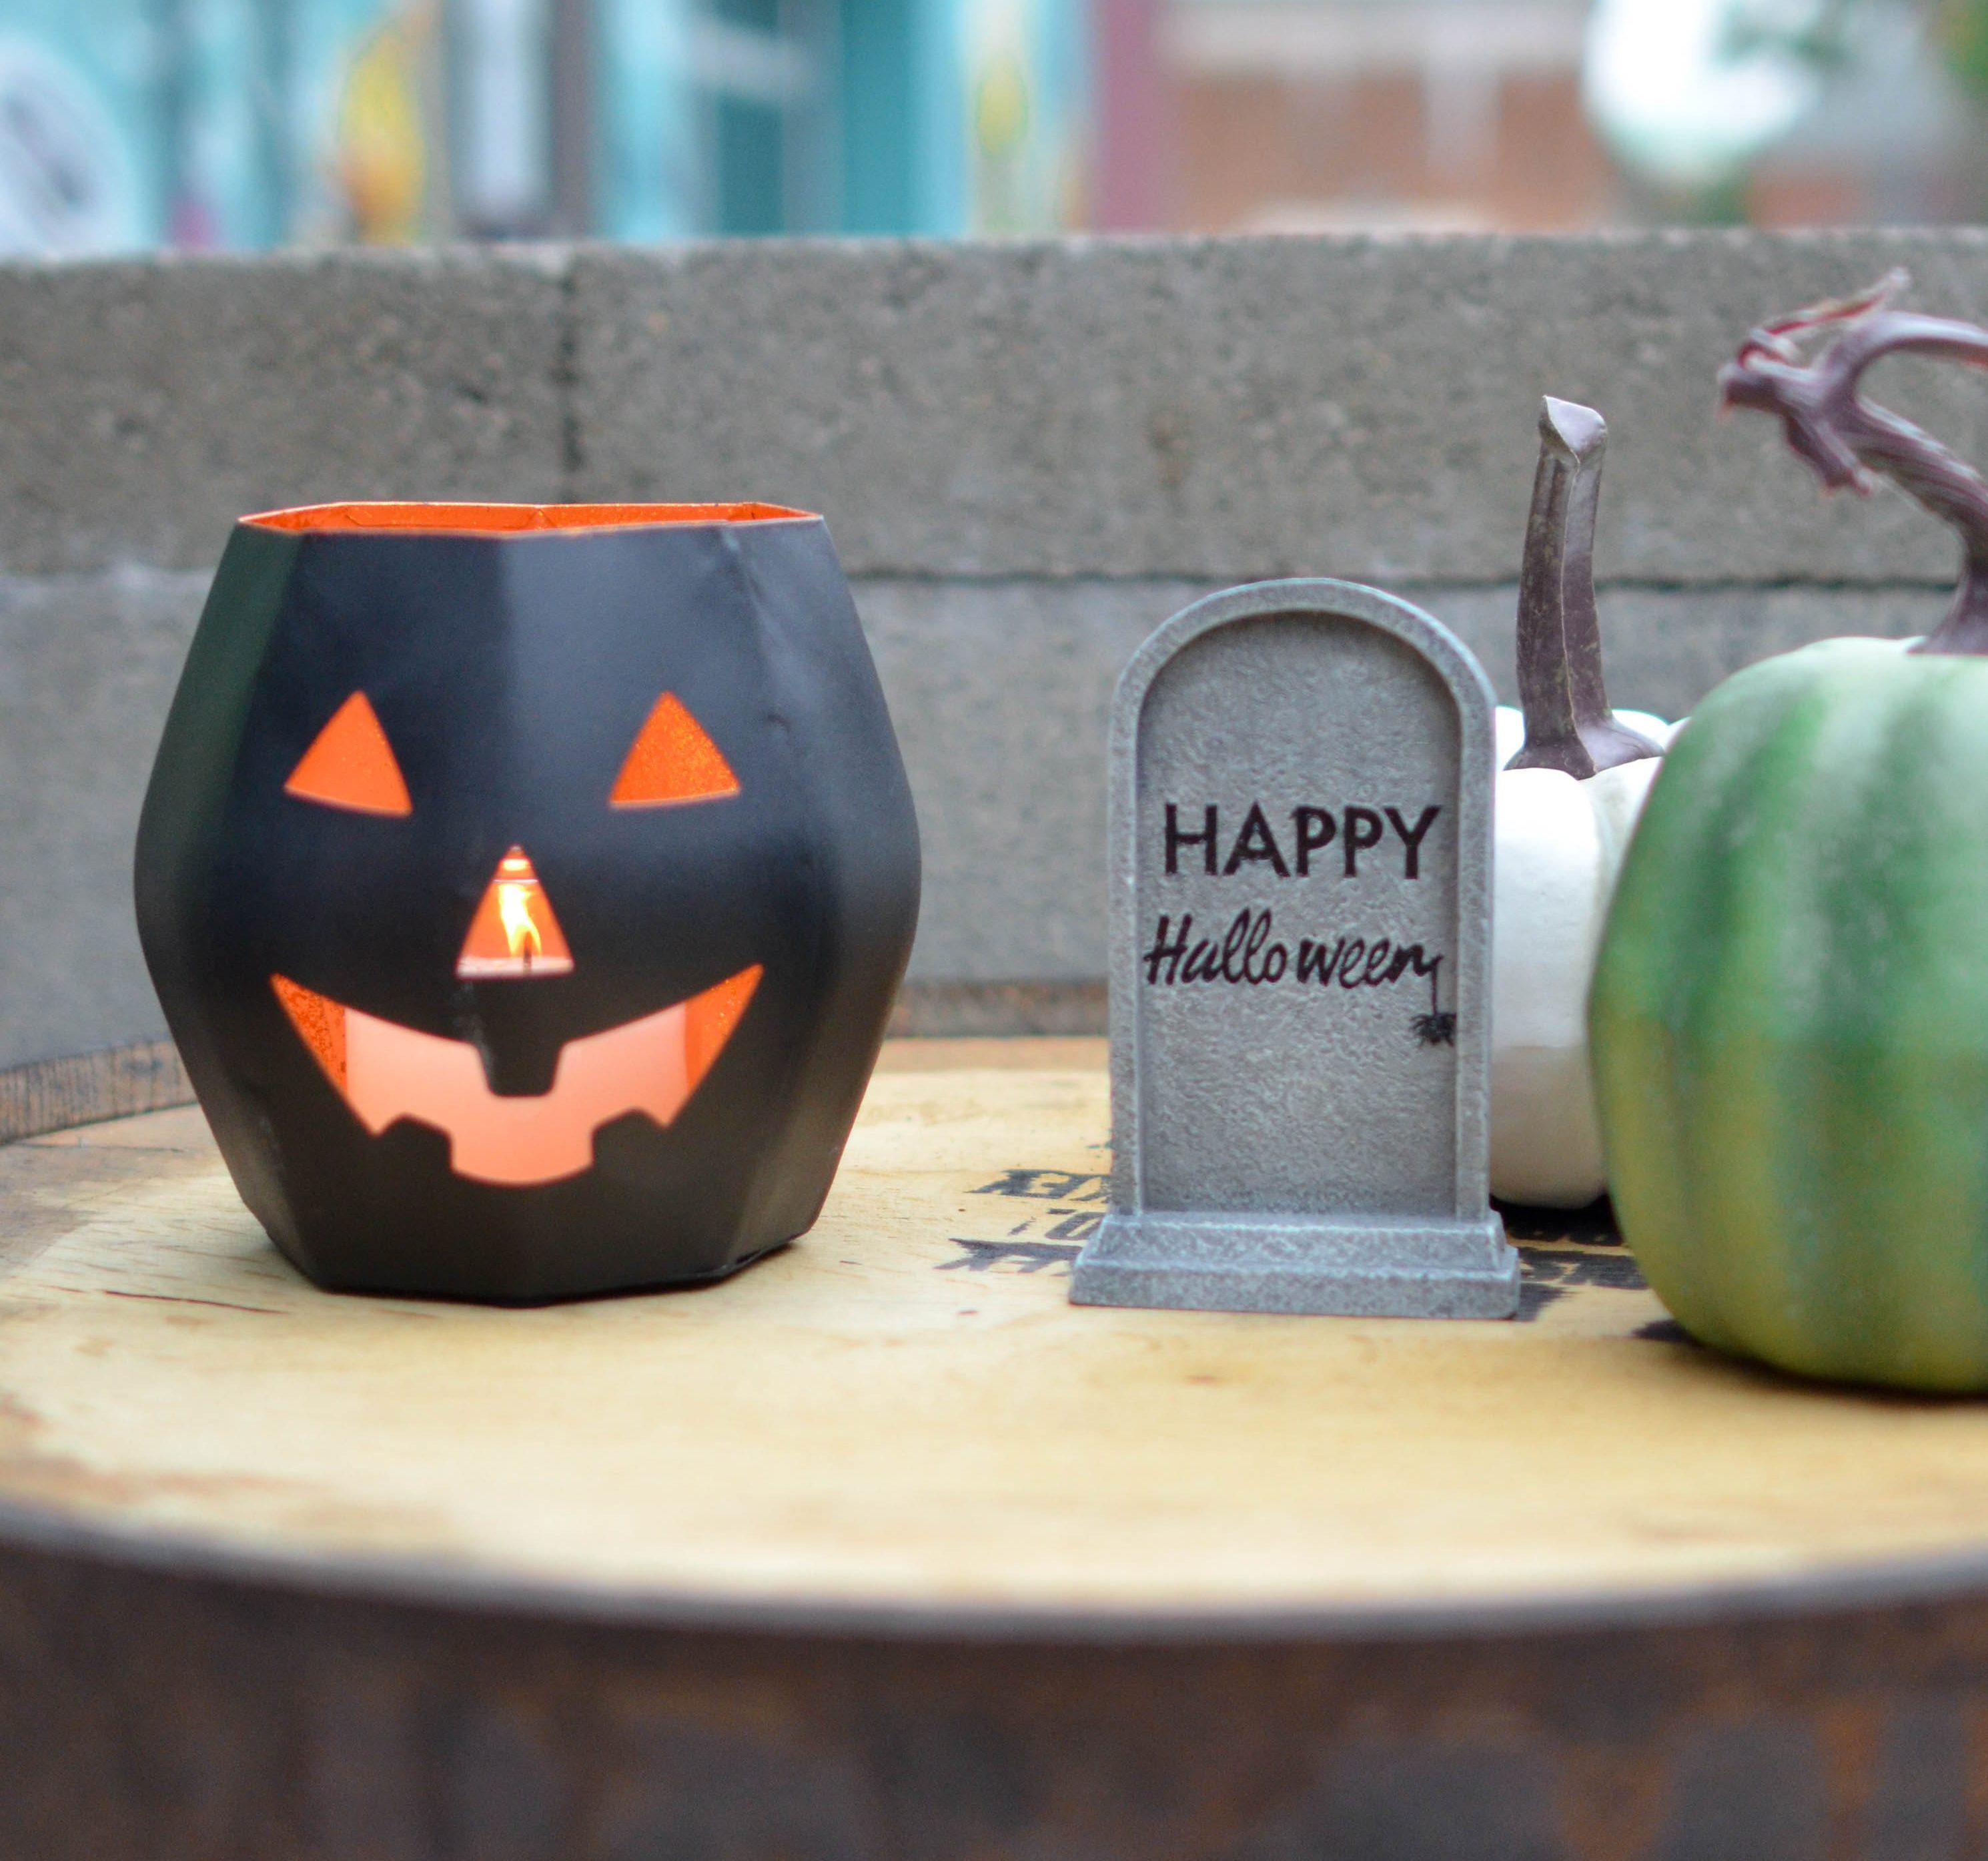 calabaza hecha en casa de halloween